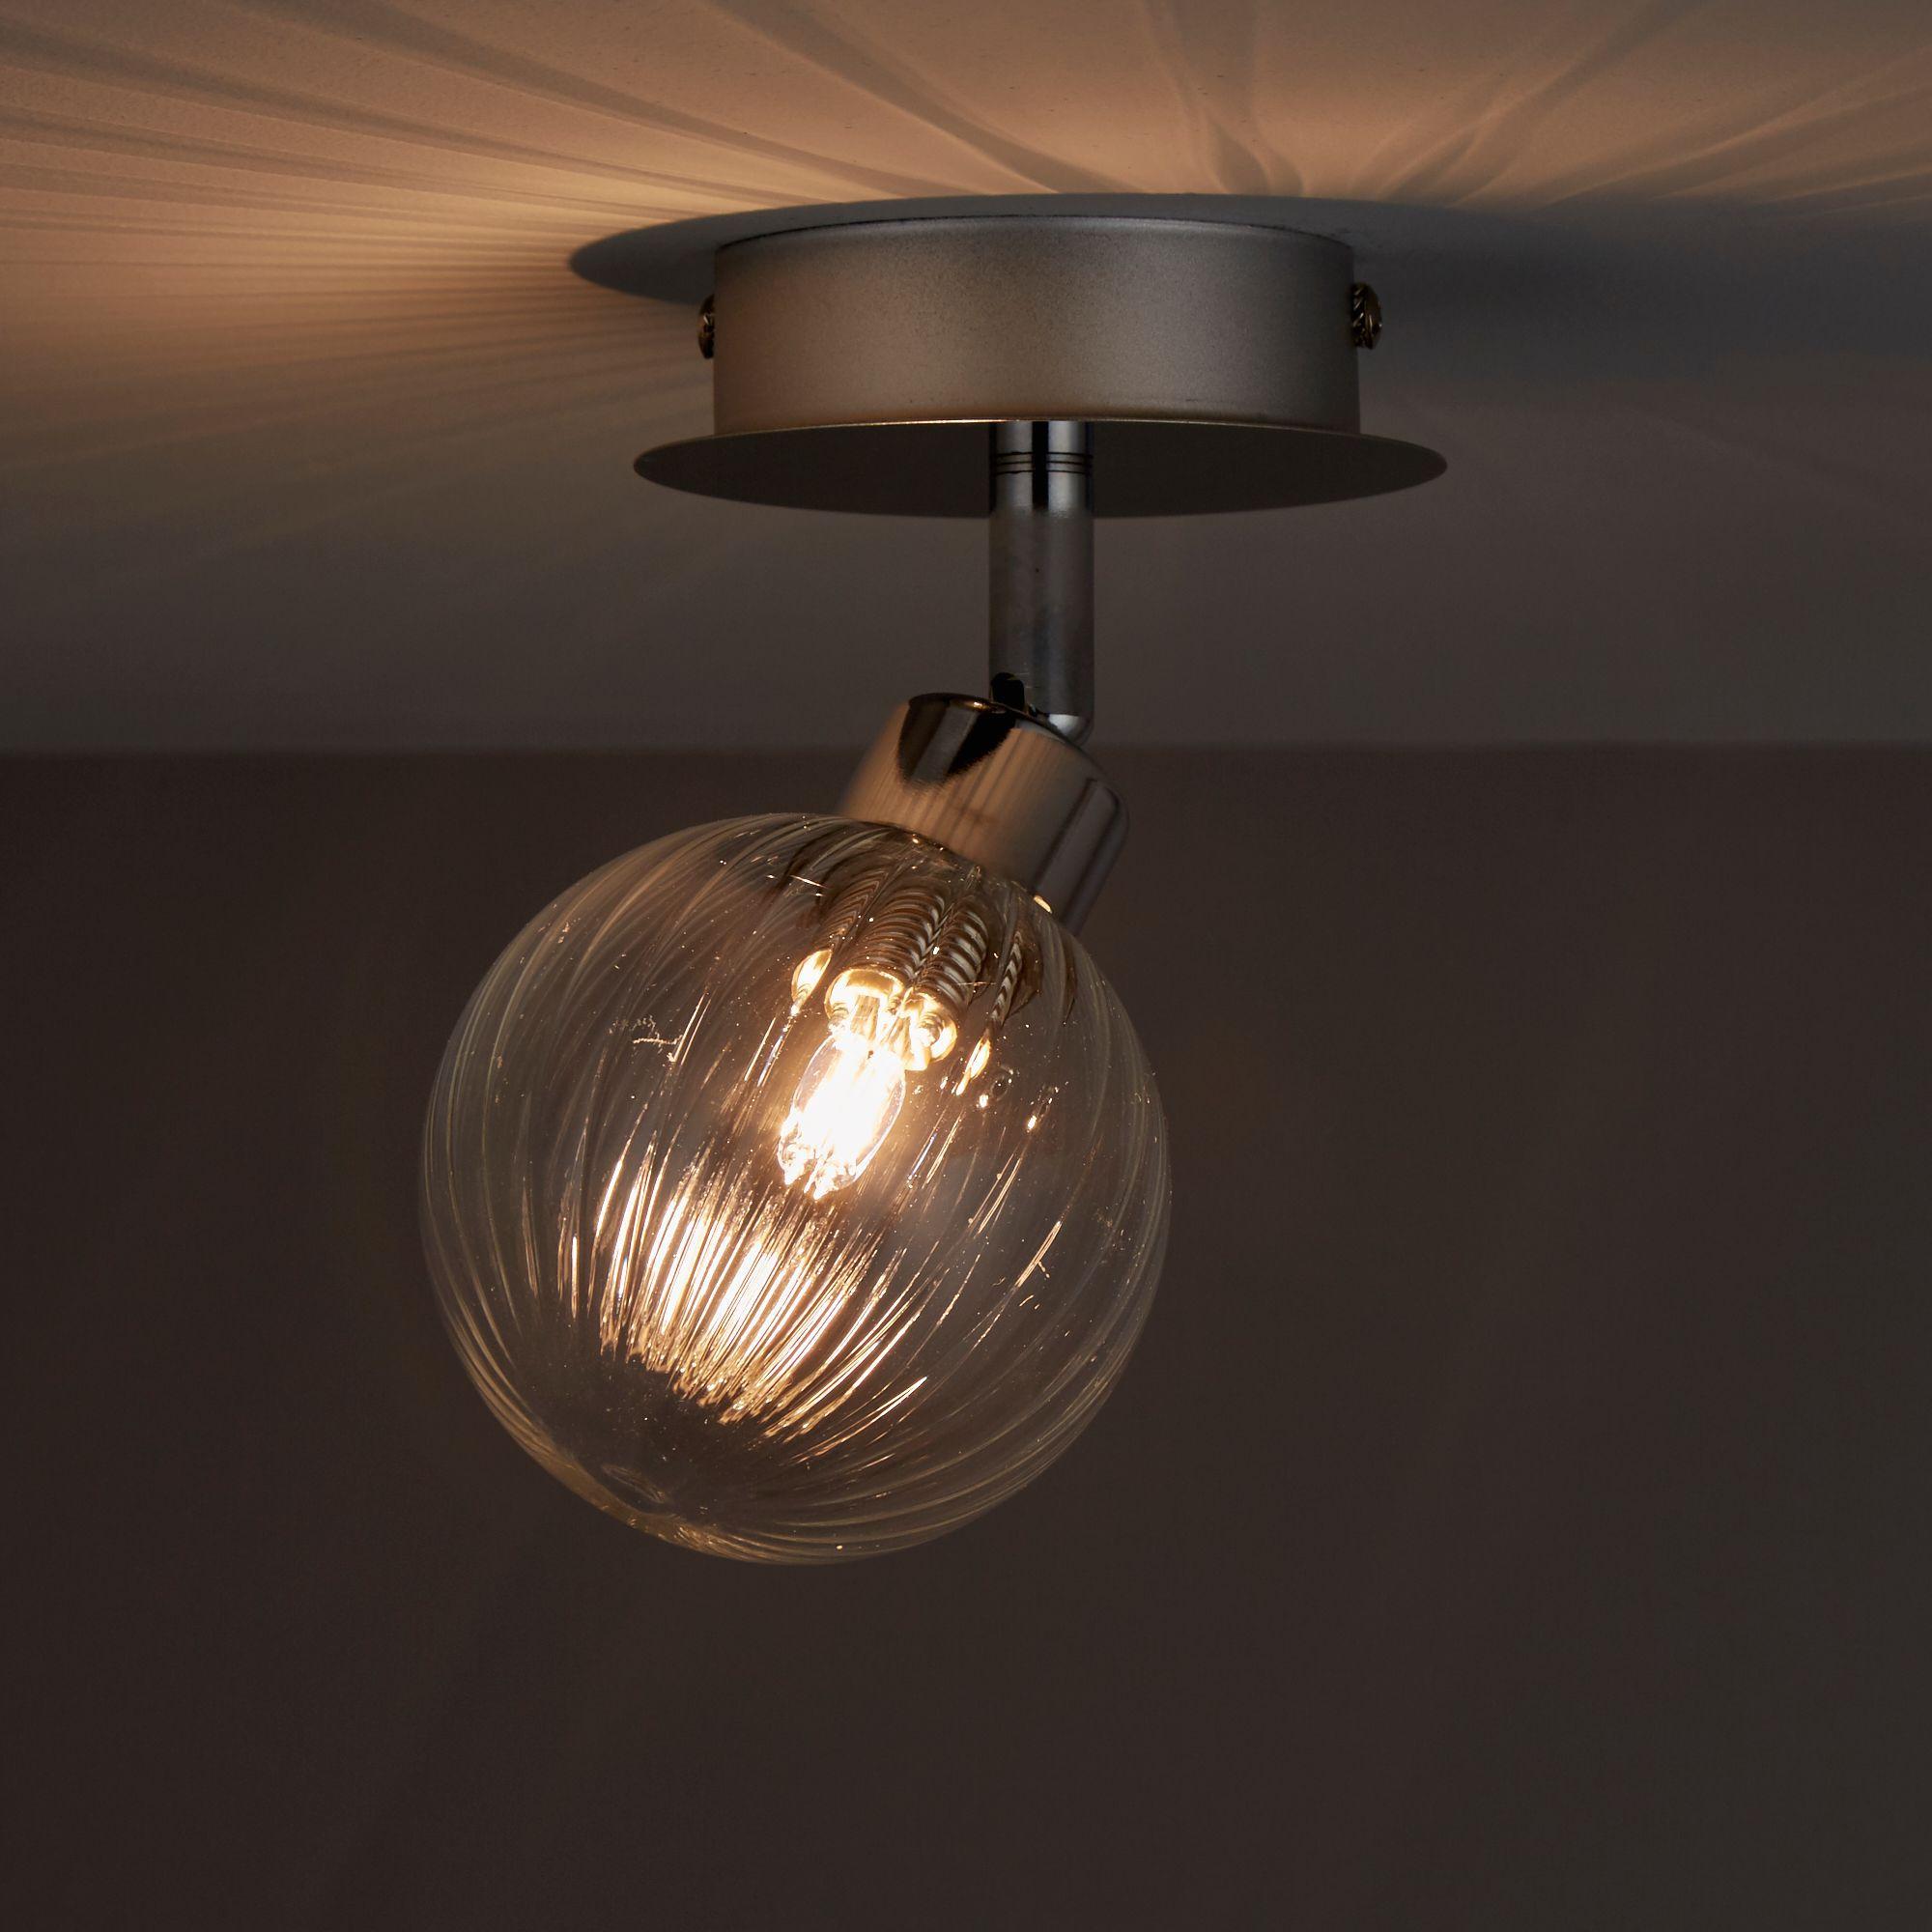 Eupraxia Chrome effect Mains-powered Spotlight Was £16, Now £4 @ B&Q (Free C&C) 2 Lamp Spotlight £8. More in OP - 2 Year Guarantee